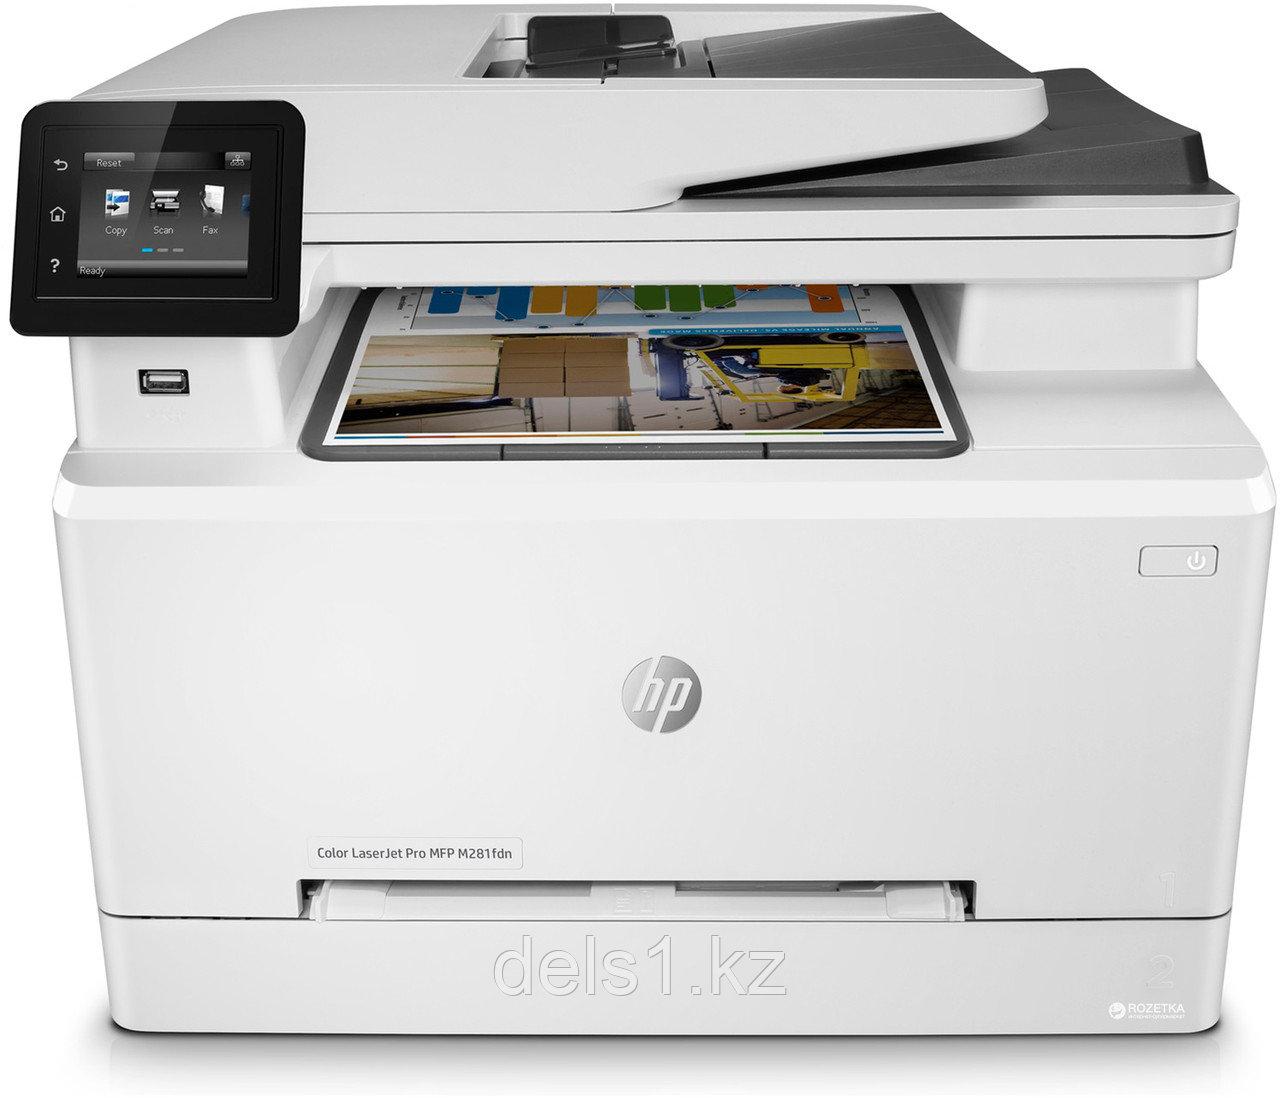 Цветное МФУ HP Color LaserJet Pro M281fdn